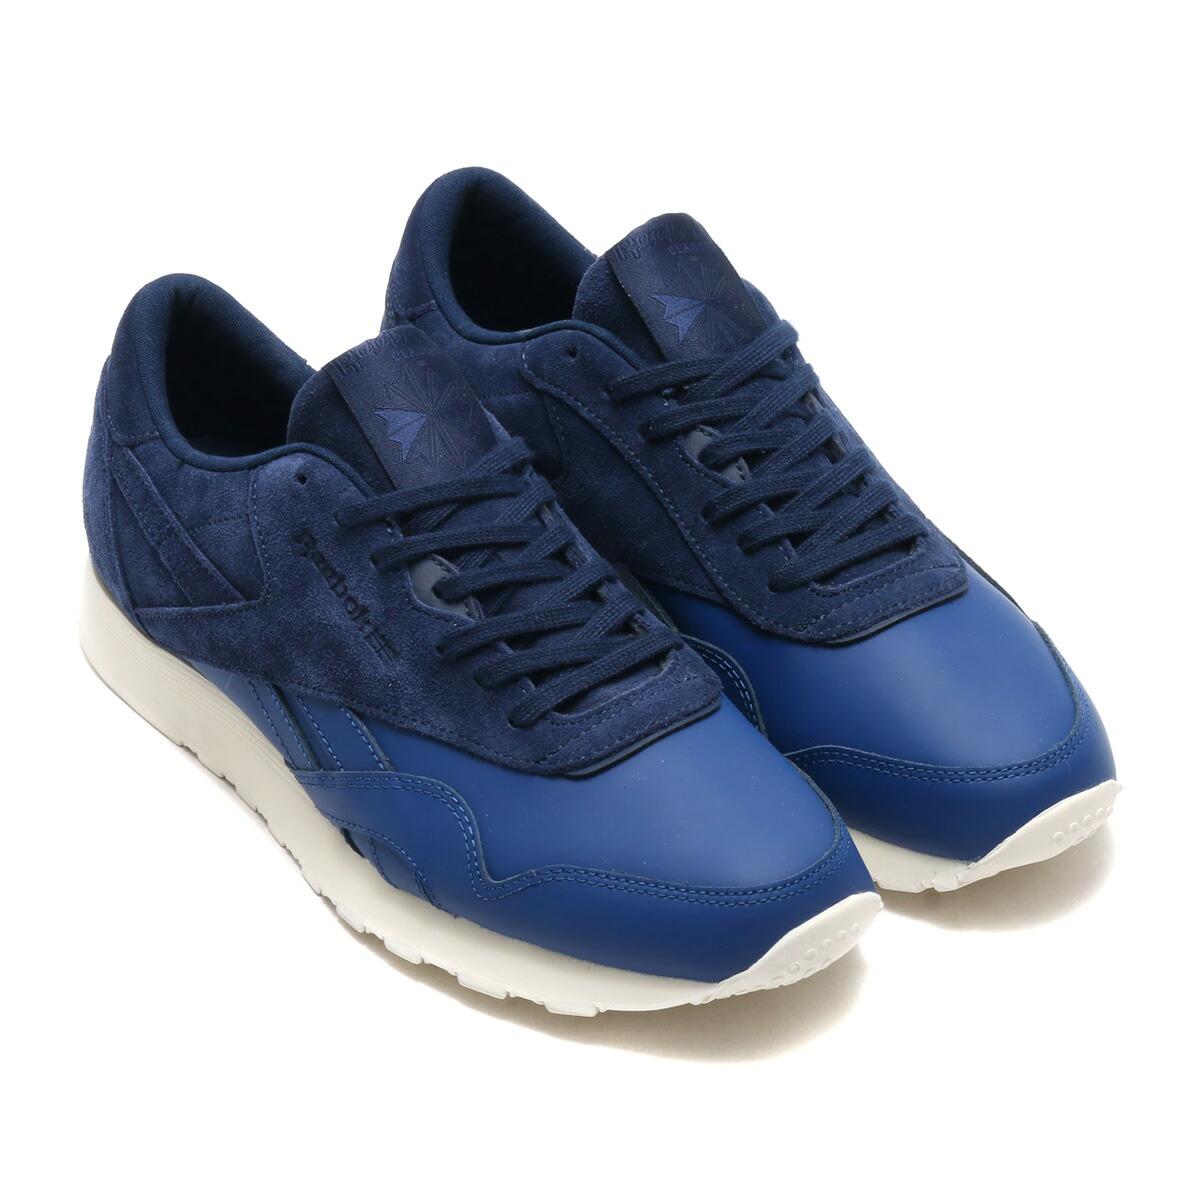 147a739b7abe Reebok CLASSIC (Reebok classical music) sneakers.